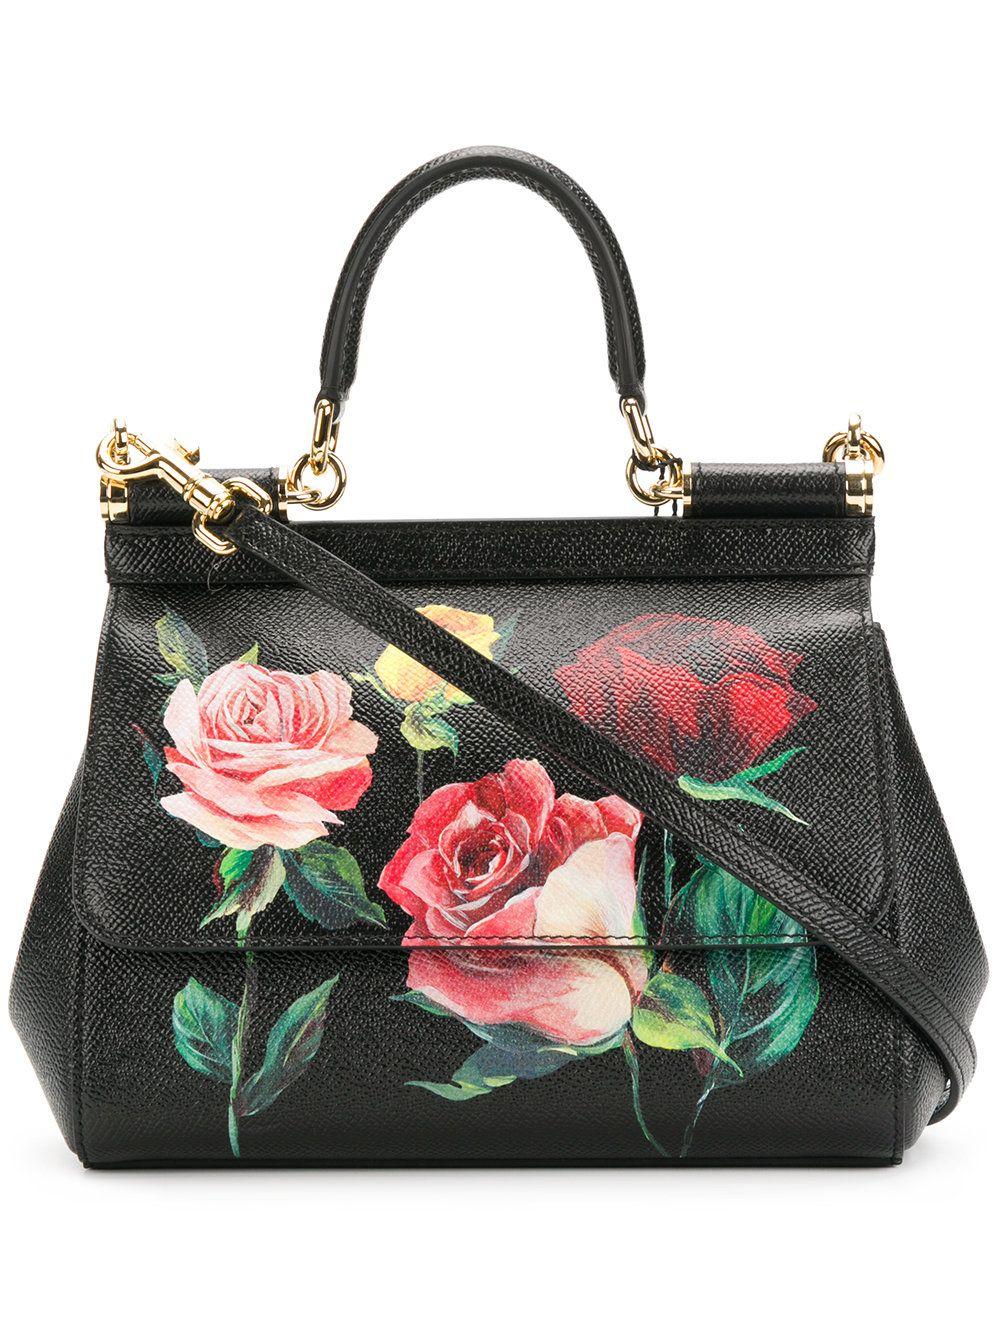 30e46b7855 DOLCE   GABBANA .  dolcegabbana  bags  shoulder bags  hand bags ...